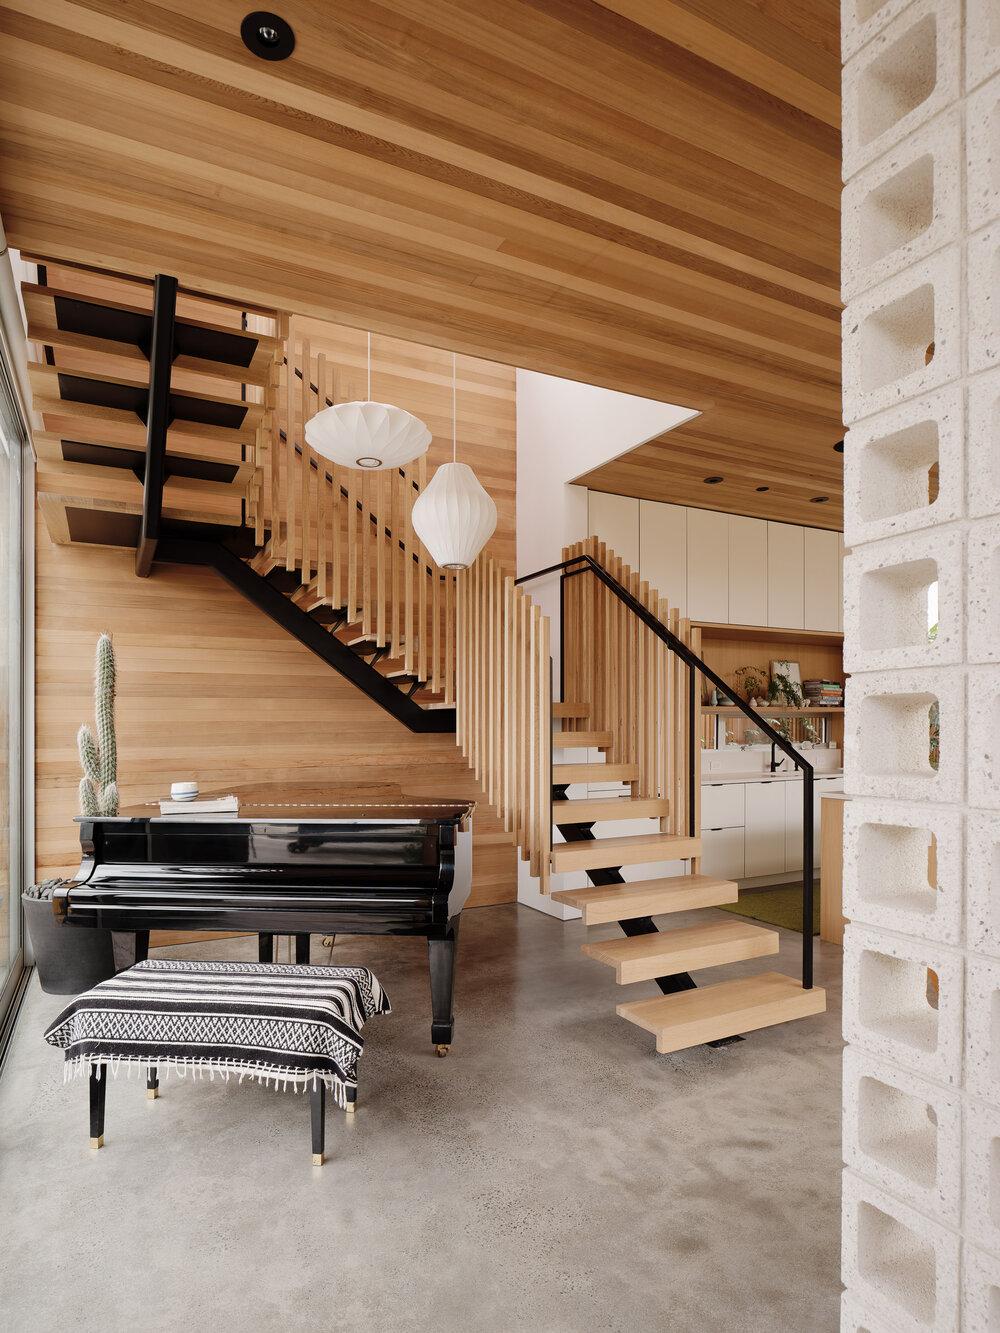 4_Walk-Street House_ras-a studio_Inspirationist